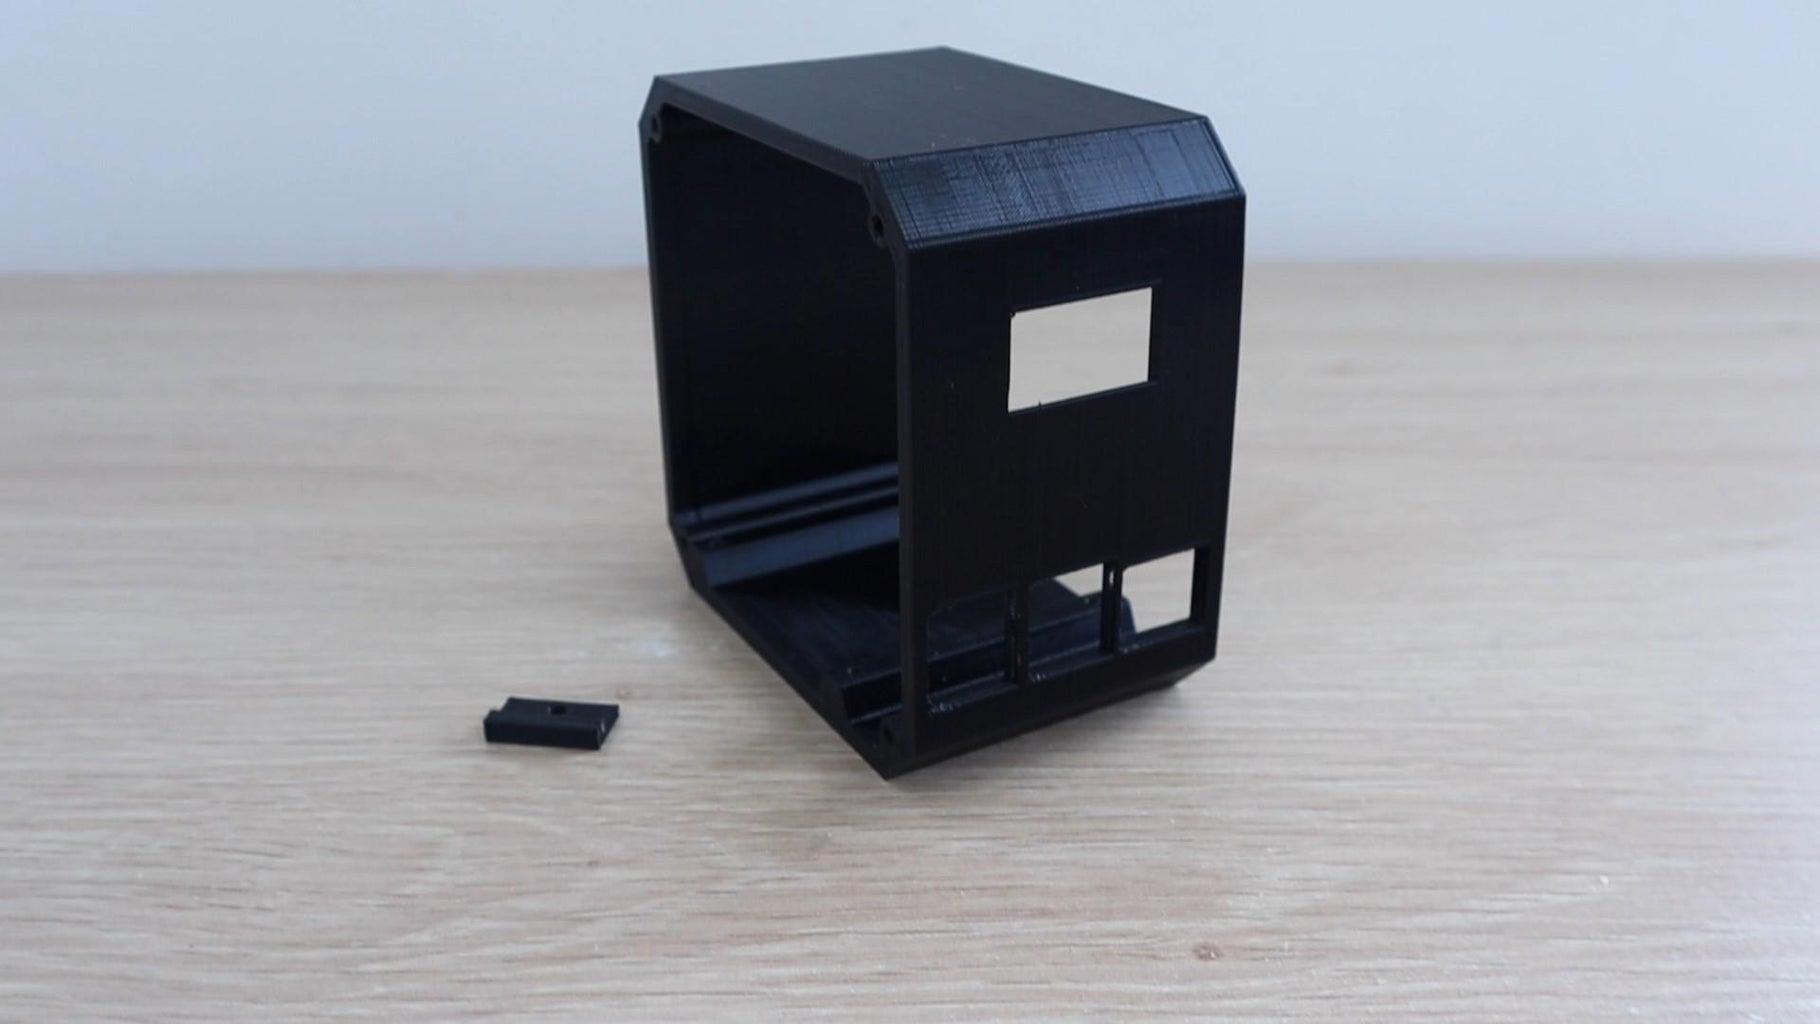 3D Print the Case Body